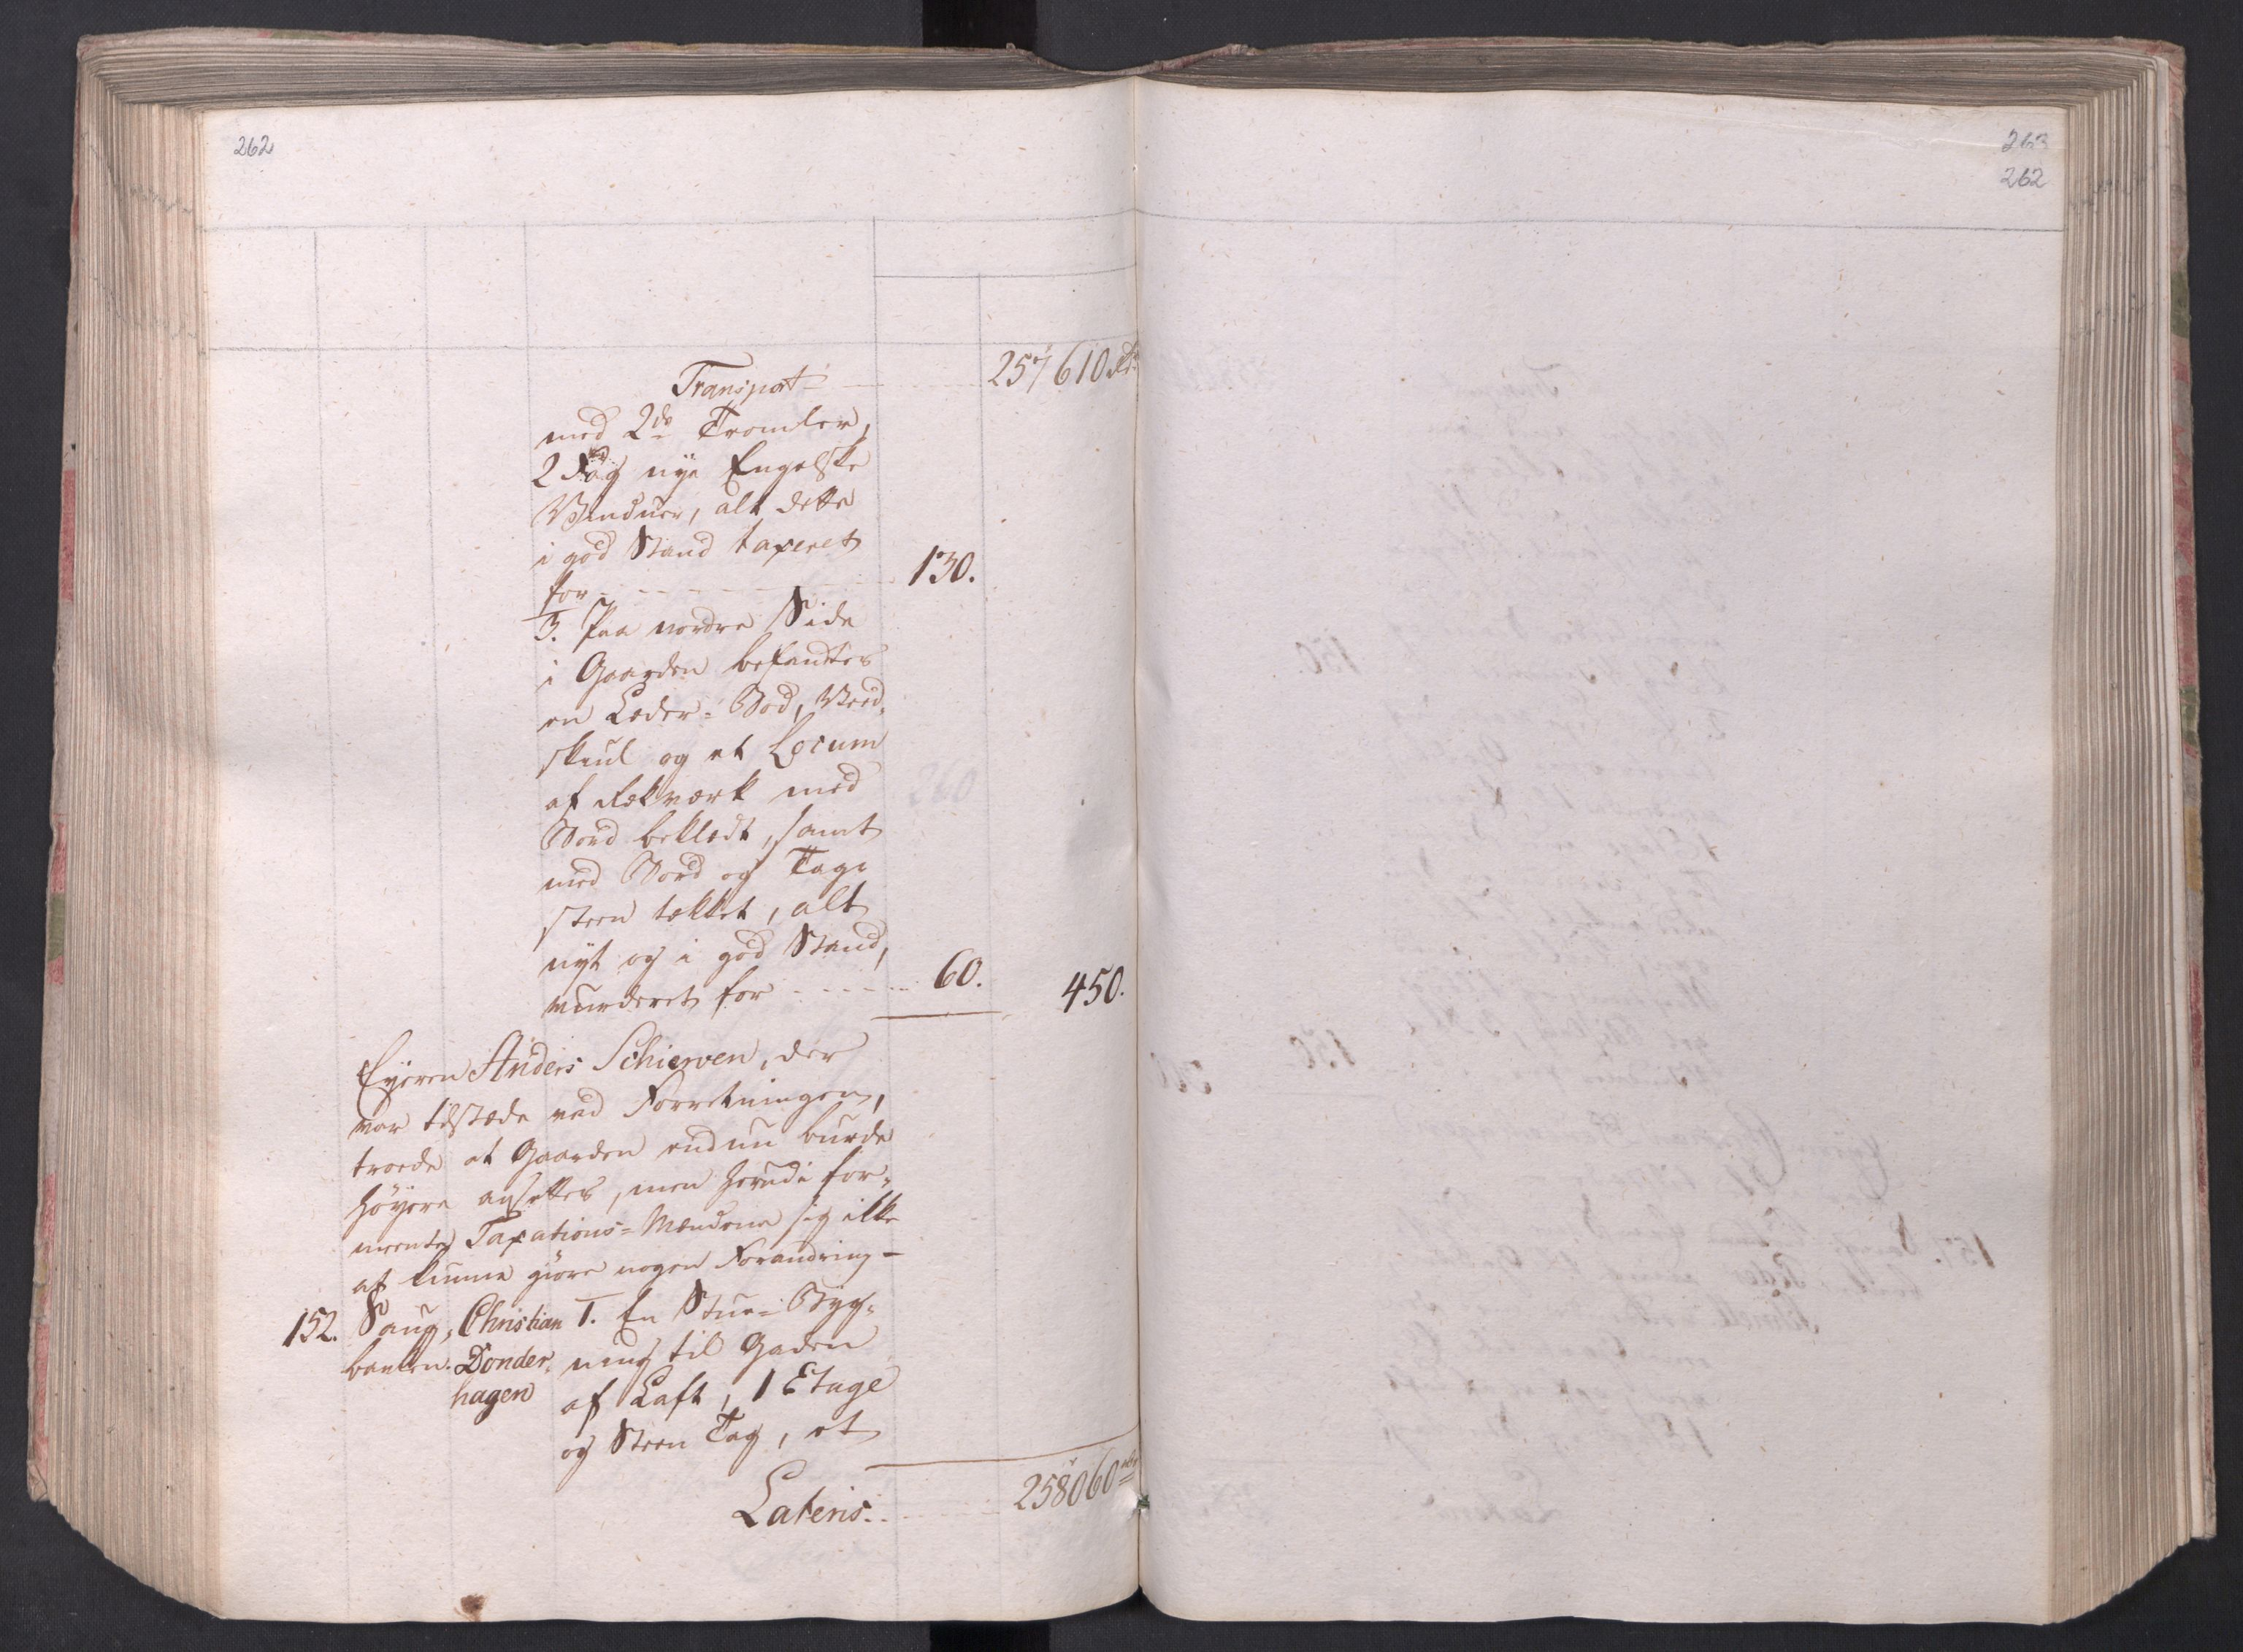 SAO, Kristiania stiftamt, I/Ia/L0015: Branntakster, 1797, s. 262